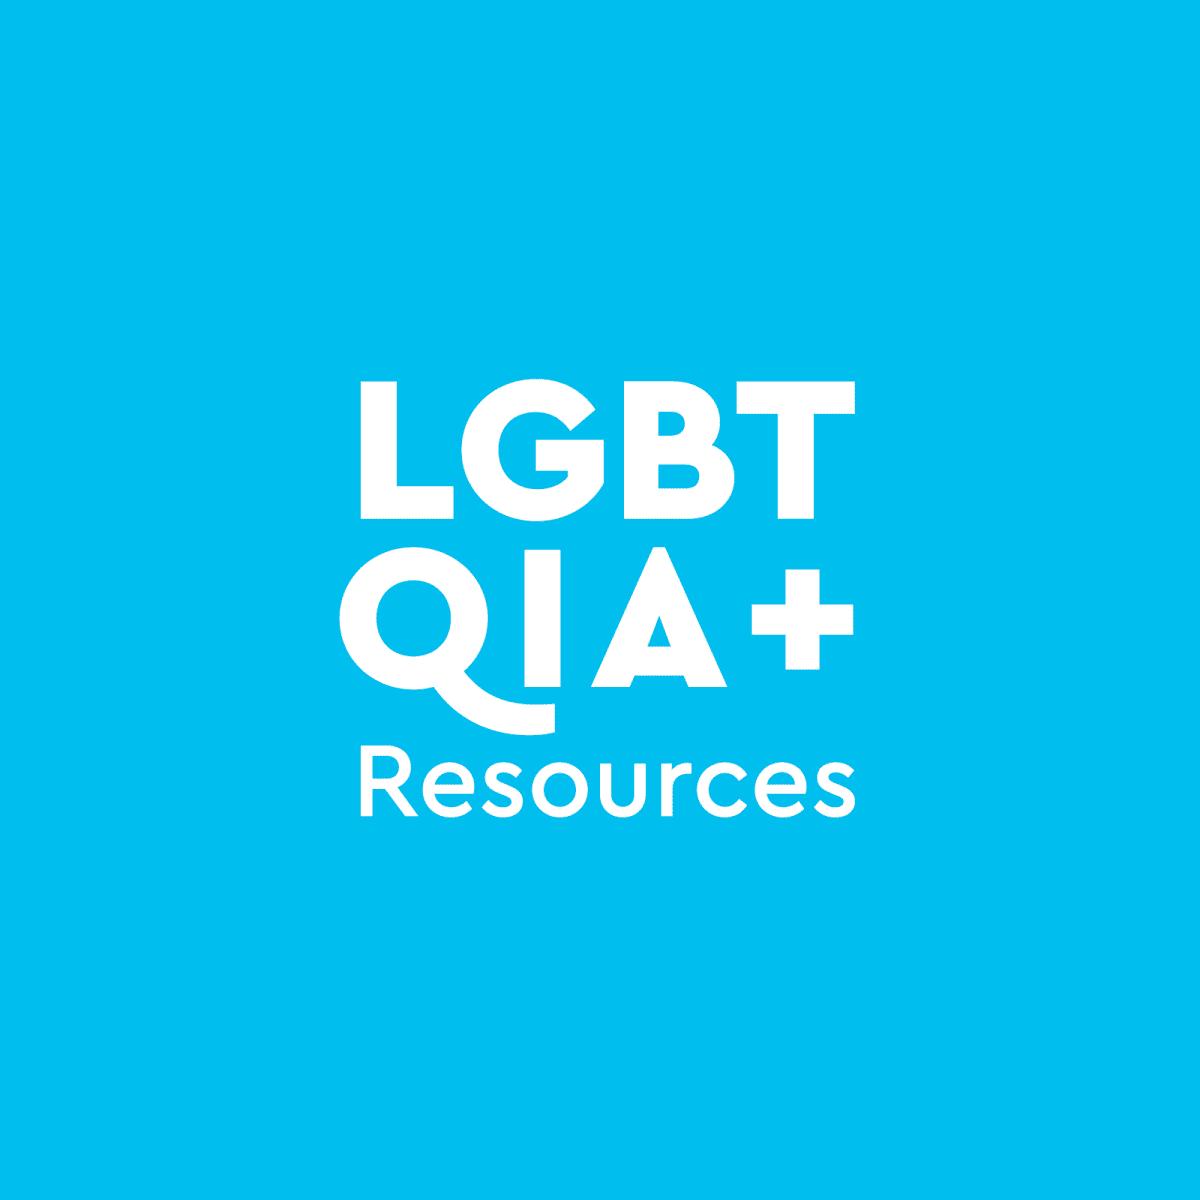 Image representing LGBTQIA+ Resources